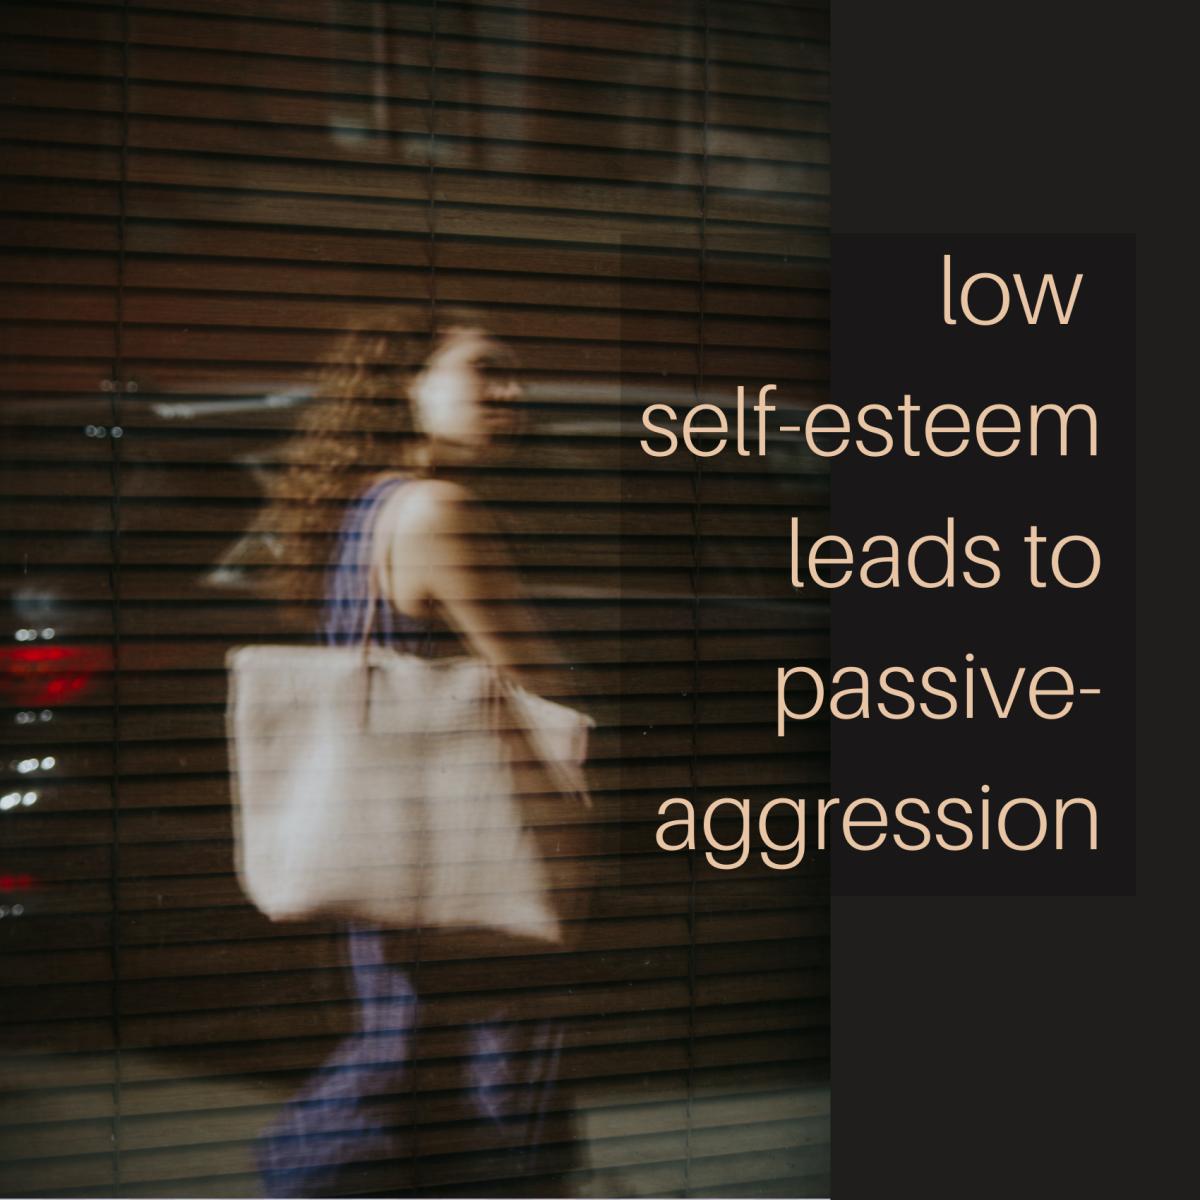 Low self-esteem can often lead to passive-aggression.